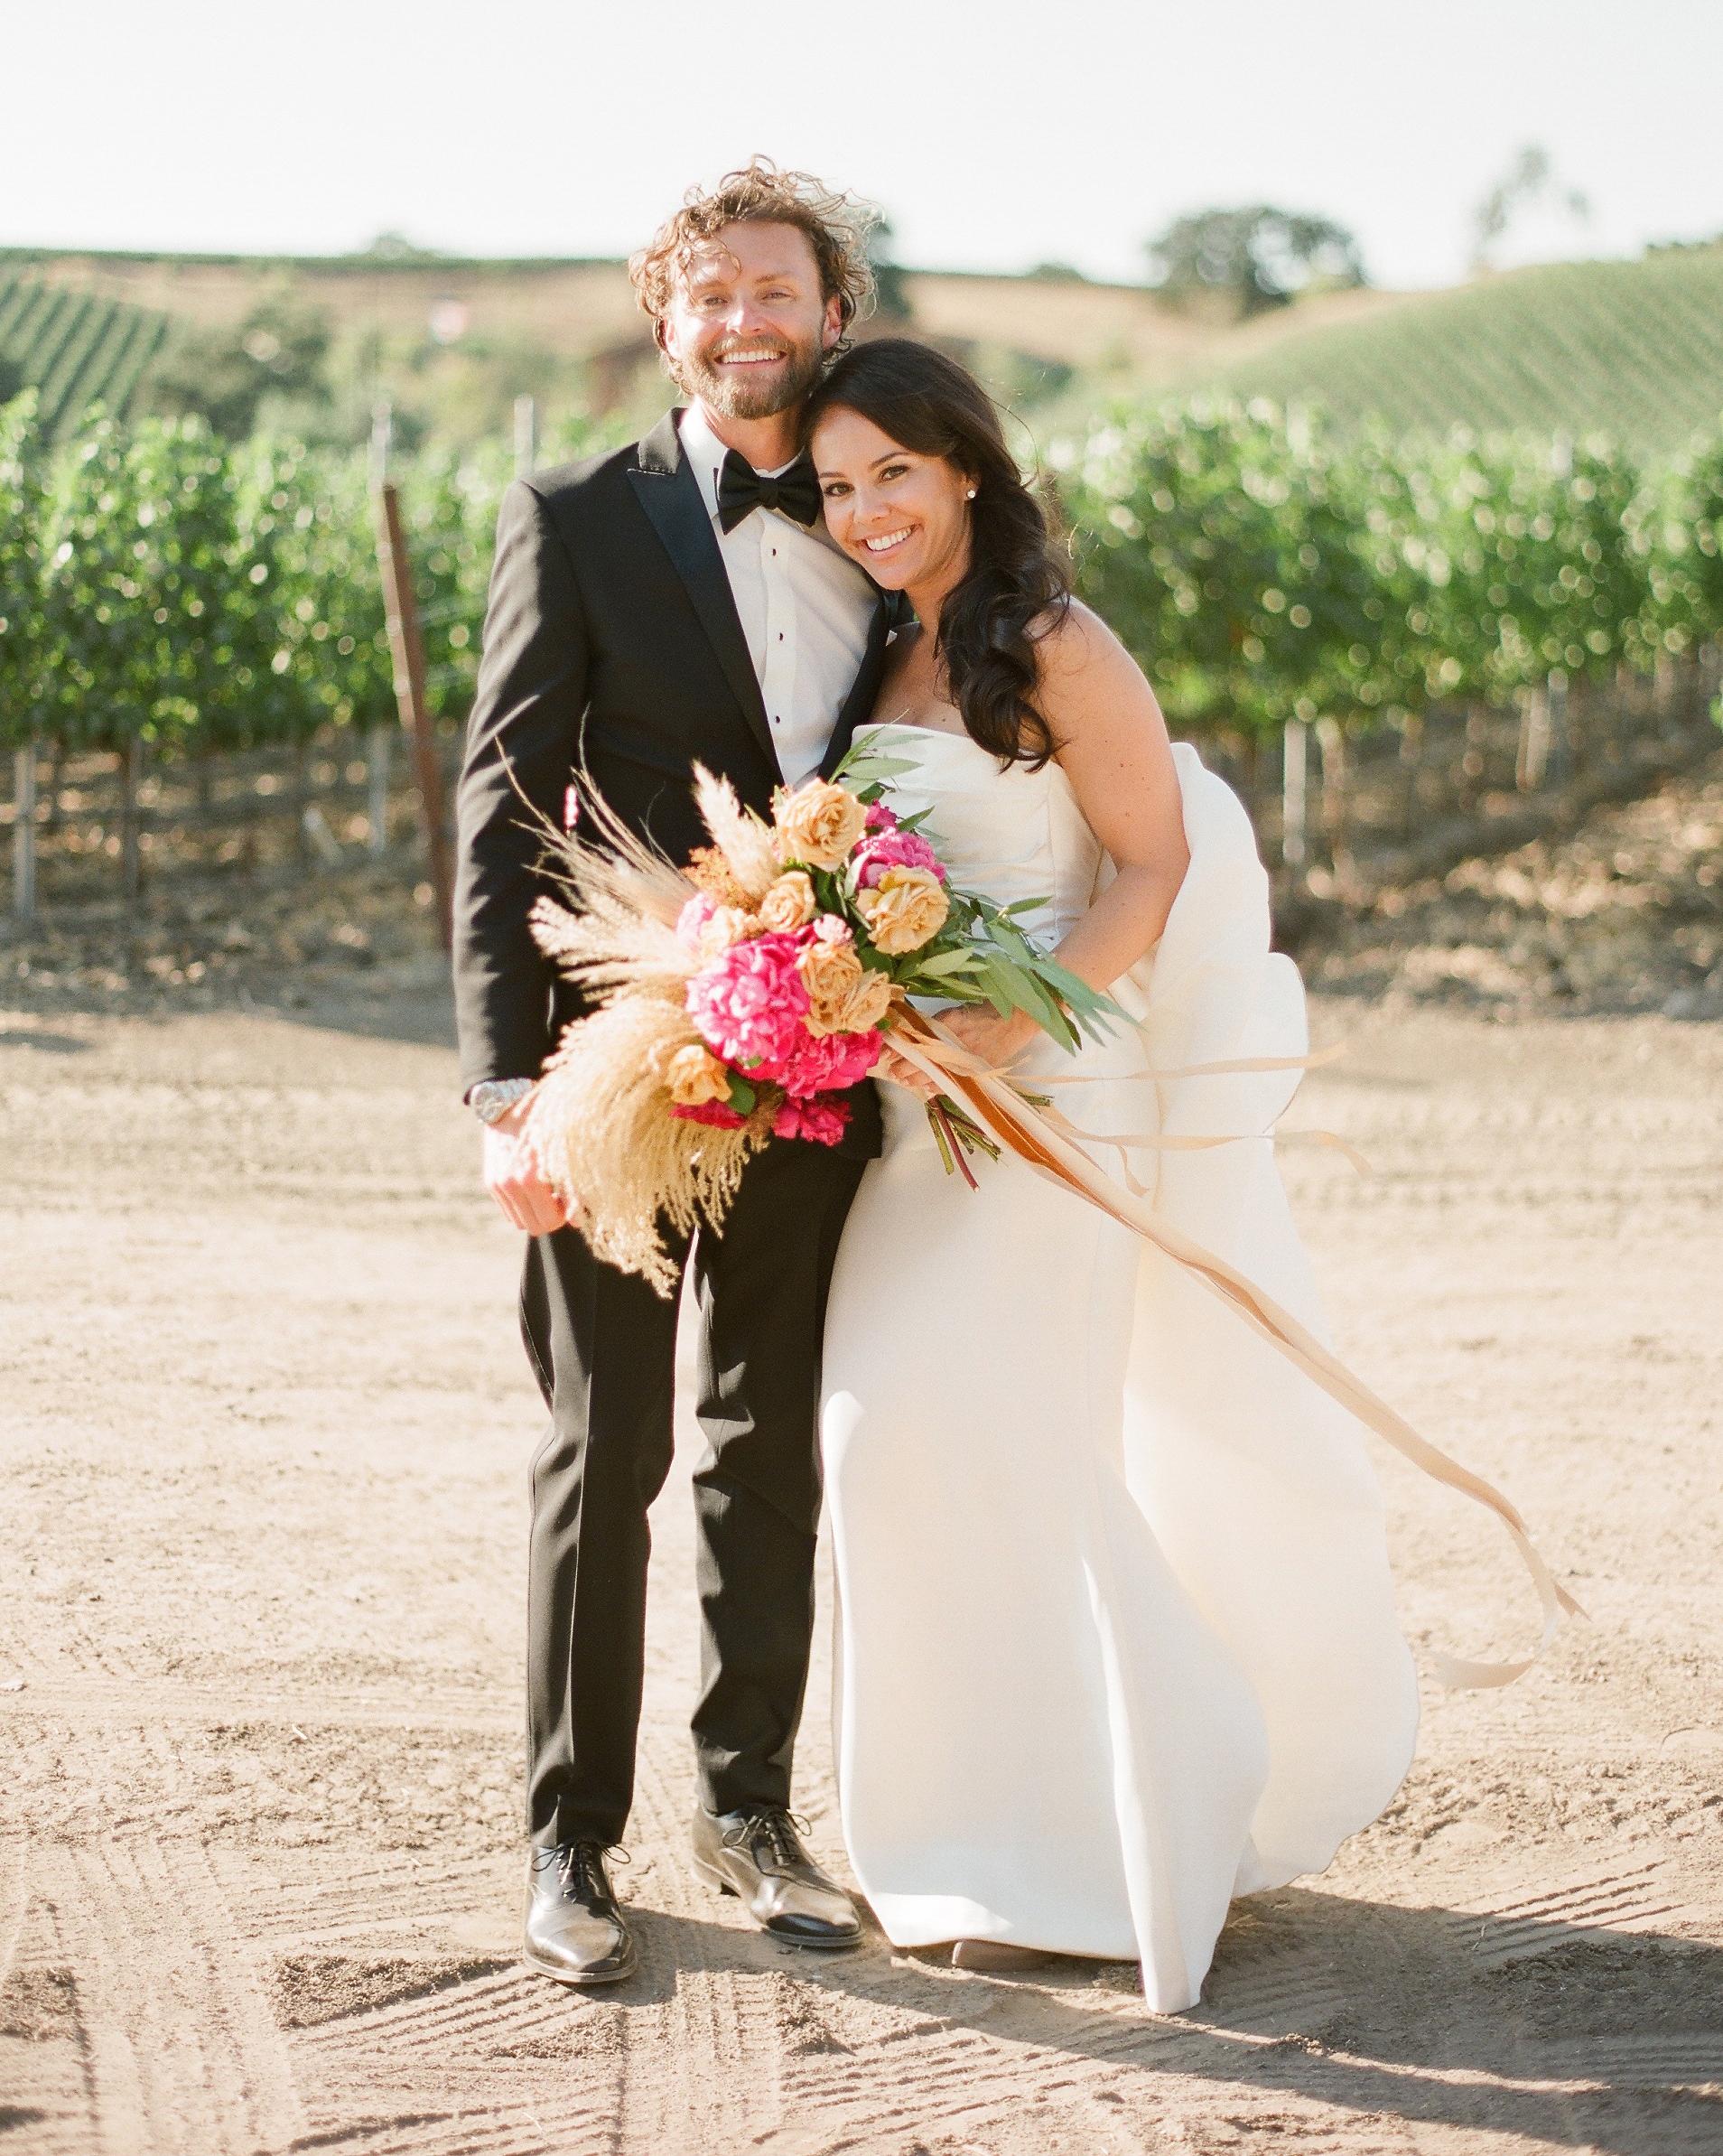 corrine-patrick-wedding-santa-ynez-44420014-1-s110842-0215.jpg